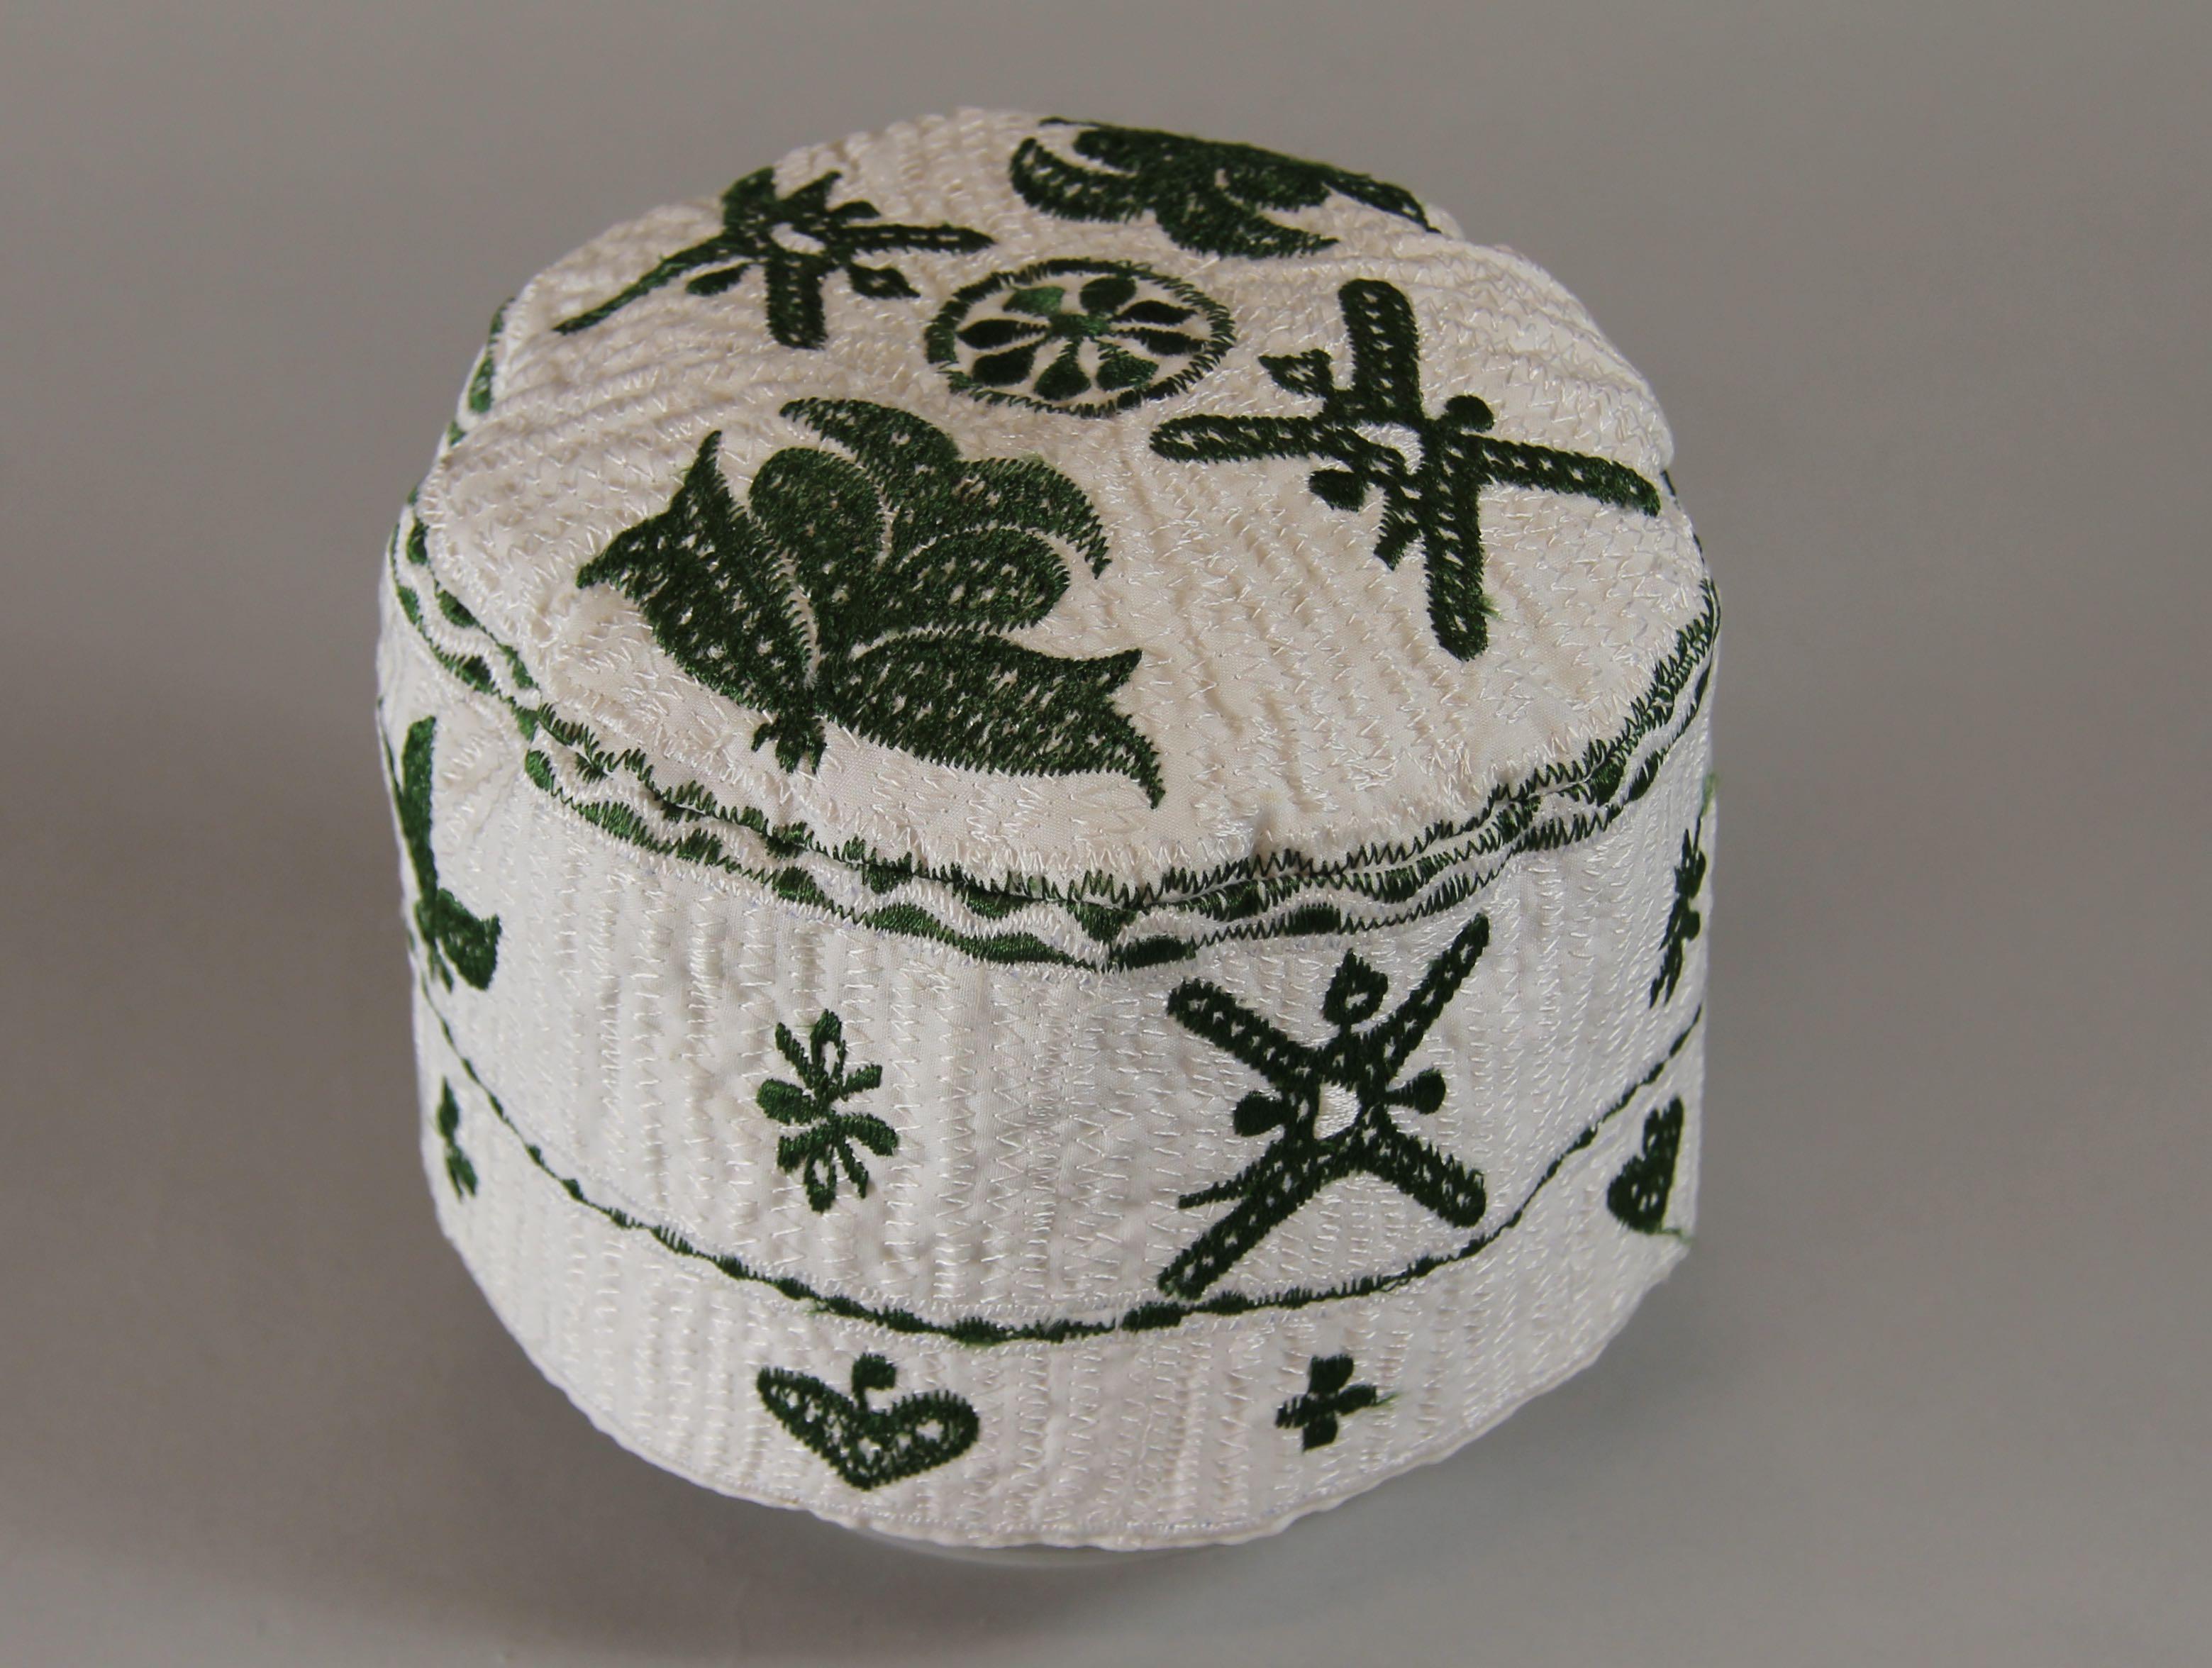 Machine-embroidered cap